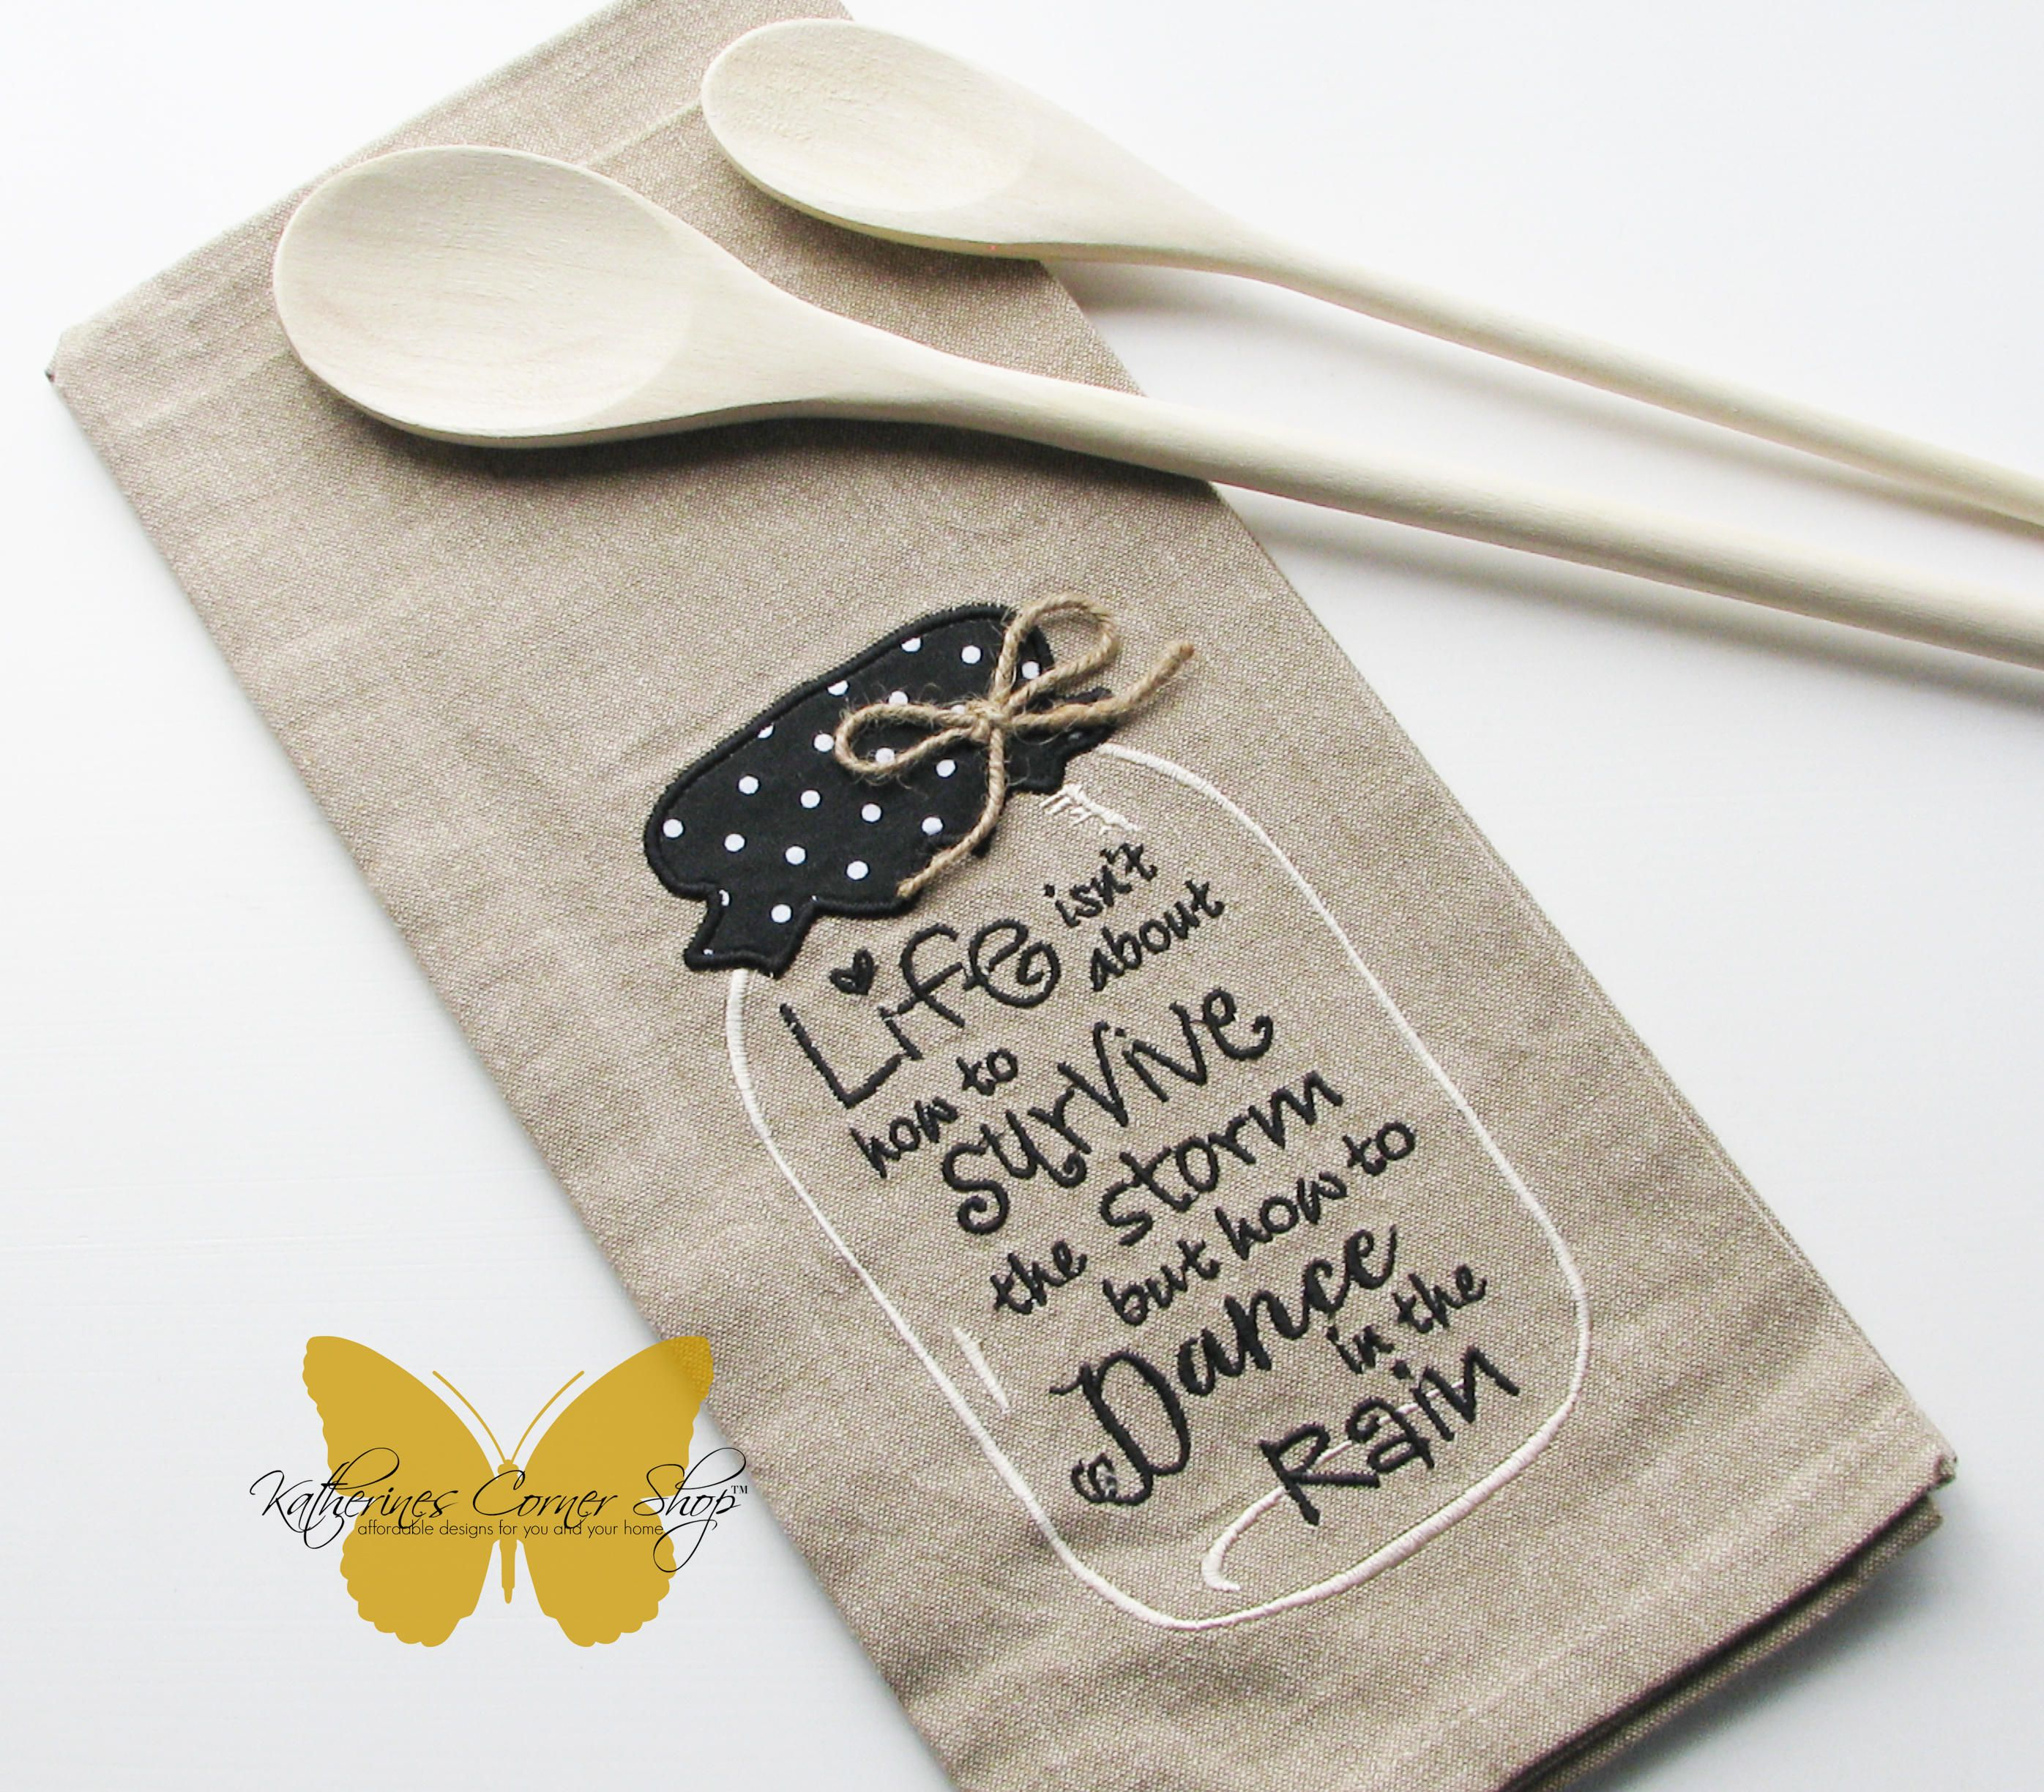 Dance in the rain embroidered mason jar tea towel with